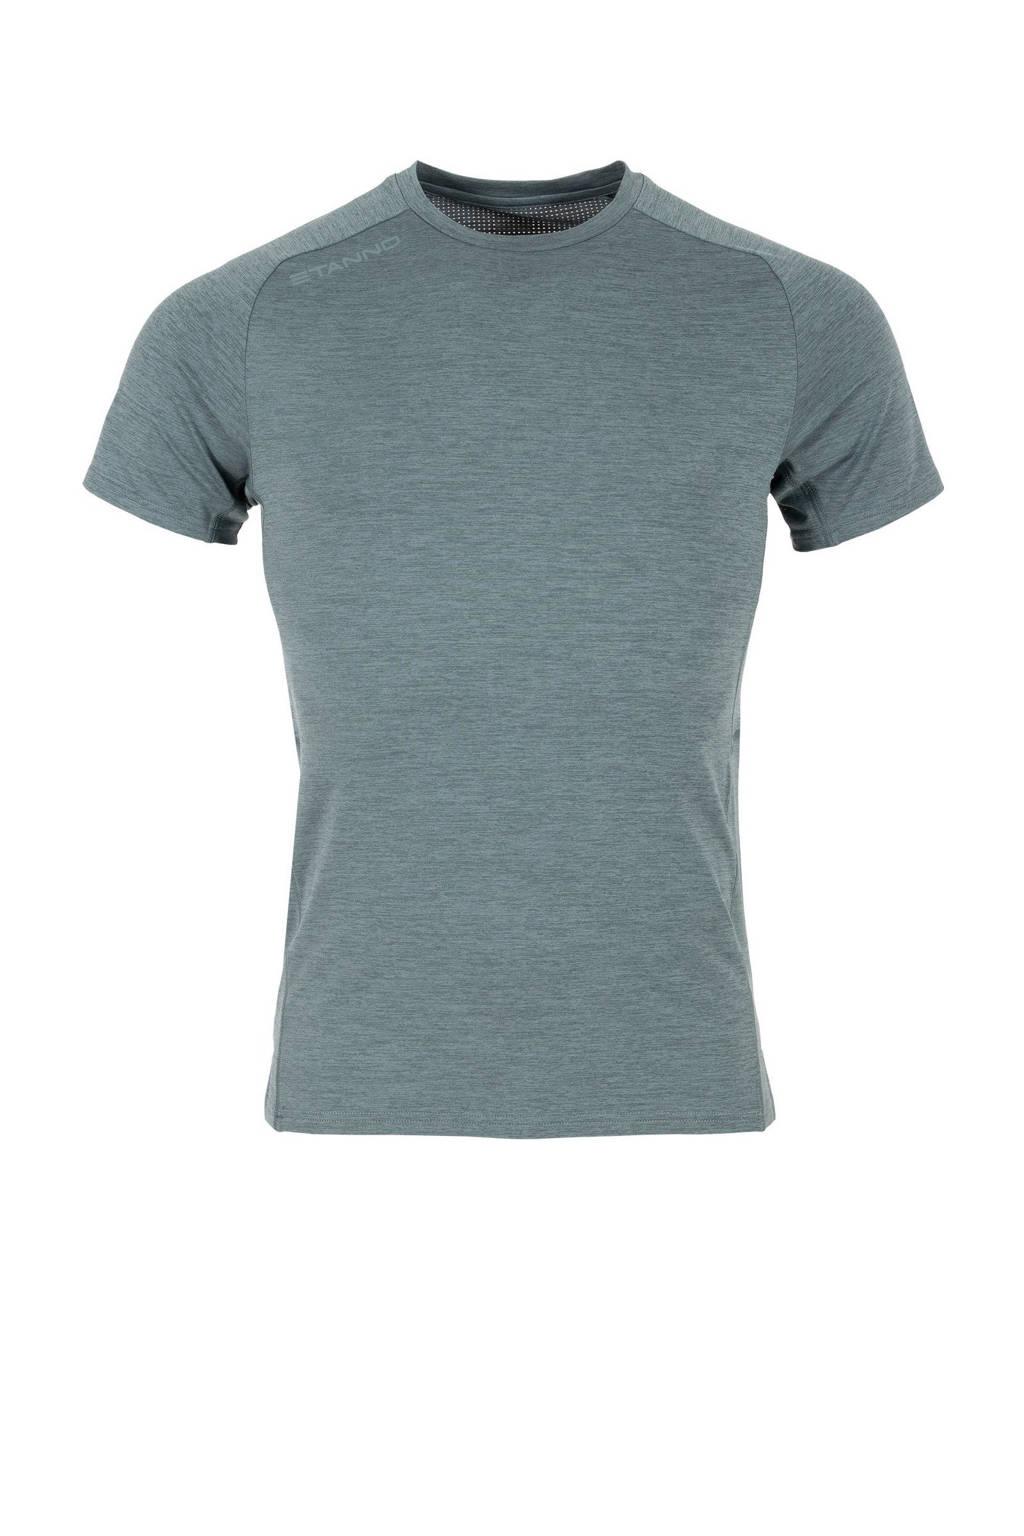 Stanno Senior  sport T-shirt groen, Groen